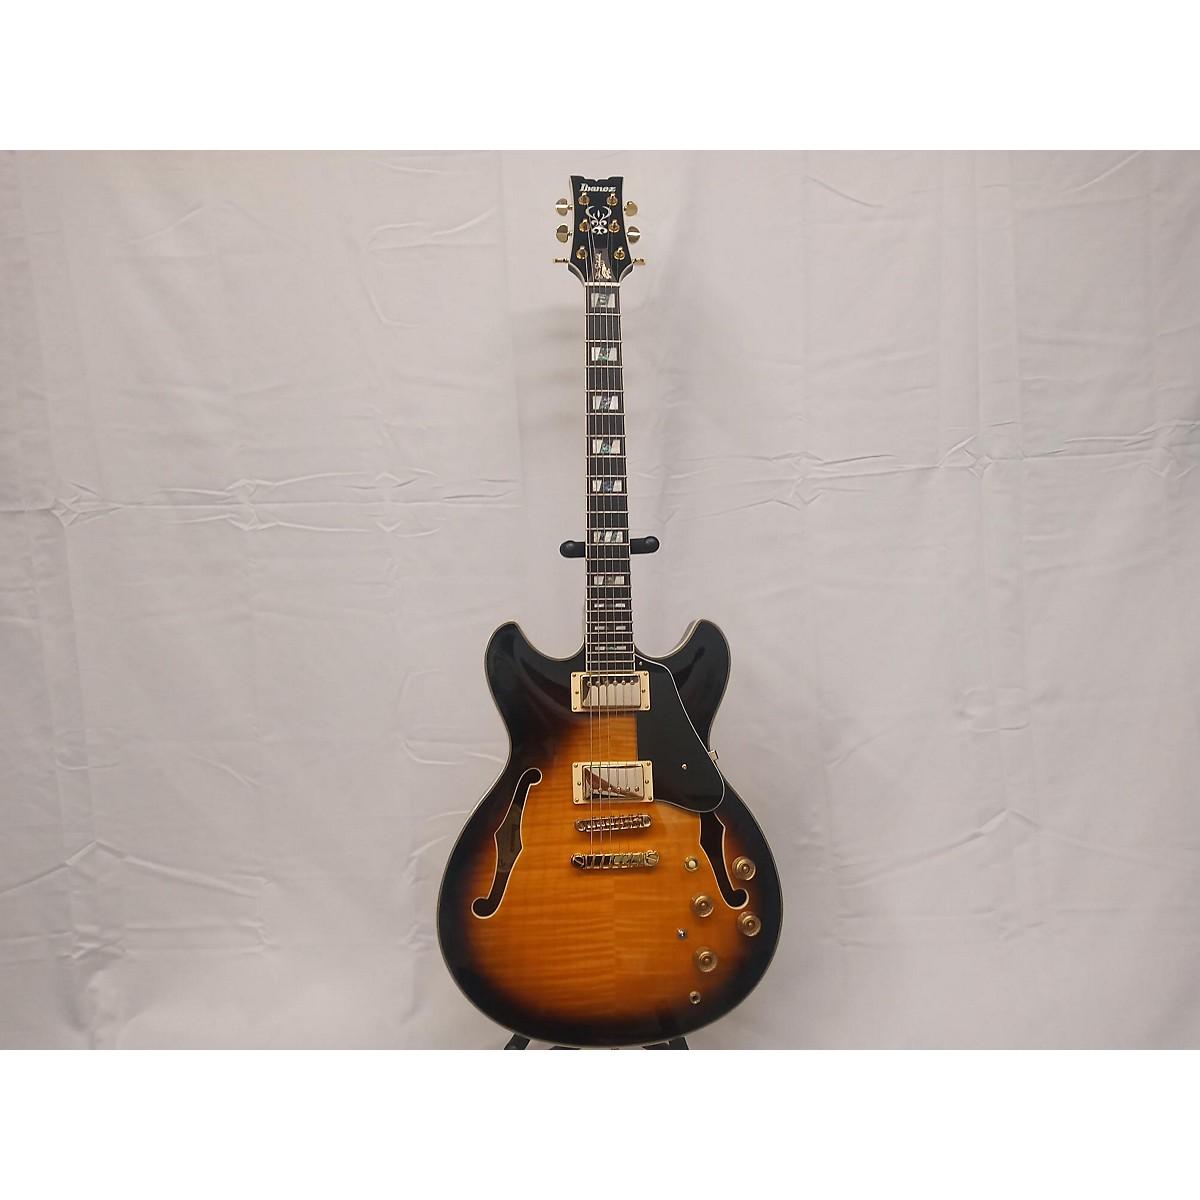 Ibanez JSM10 JOHN SCOFIELD Hollow Body Electric Guitar